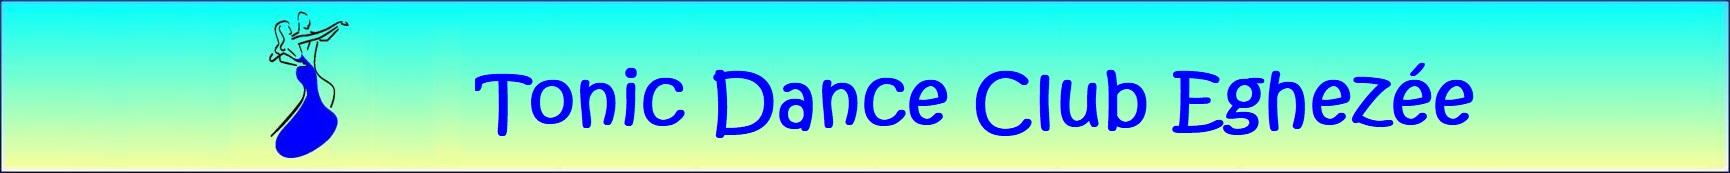 Tonic Dance Club d'Eghezée